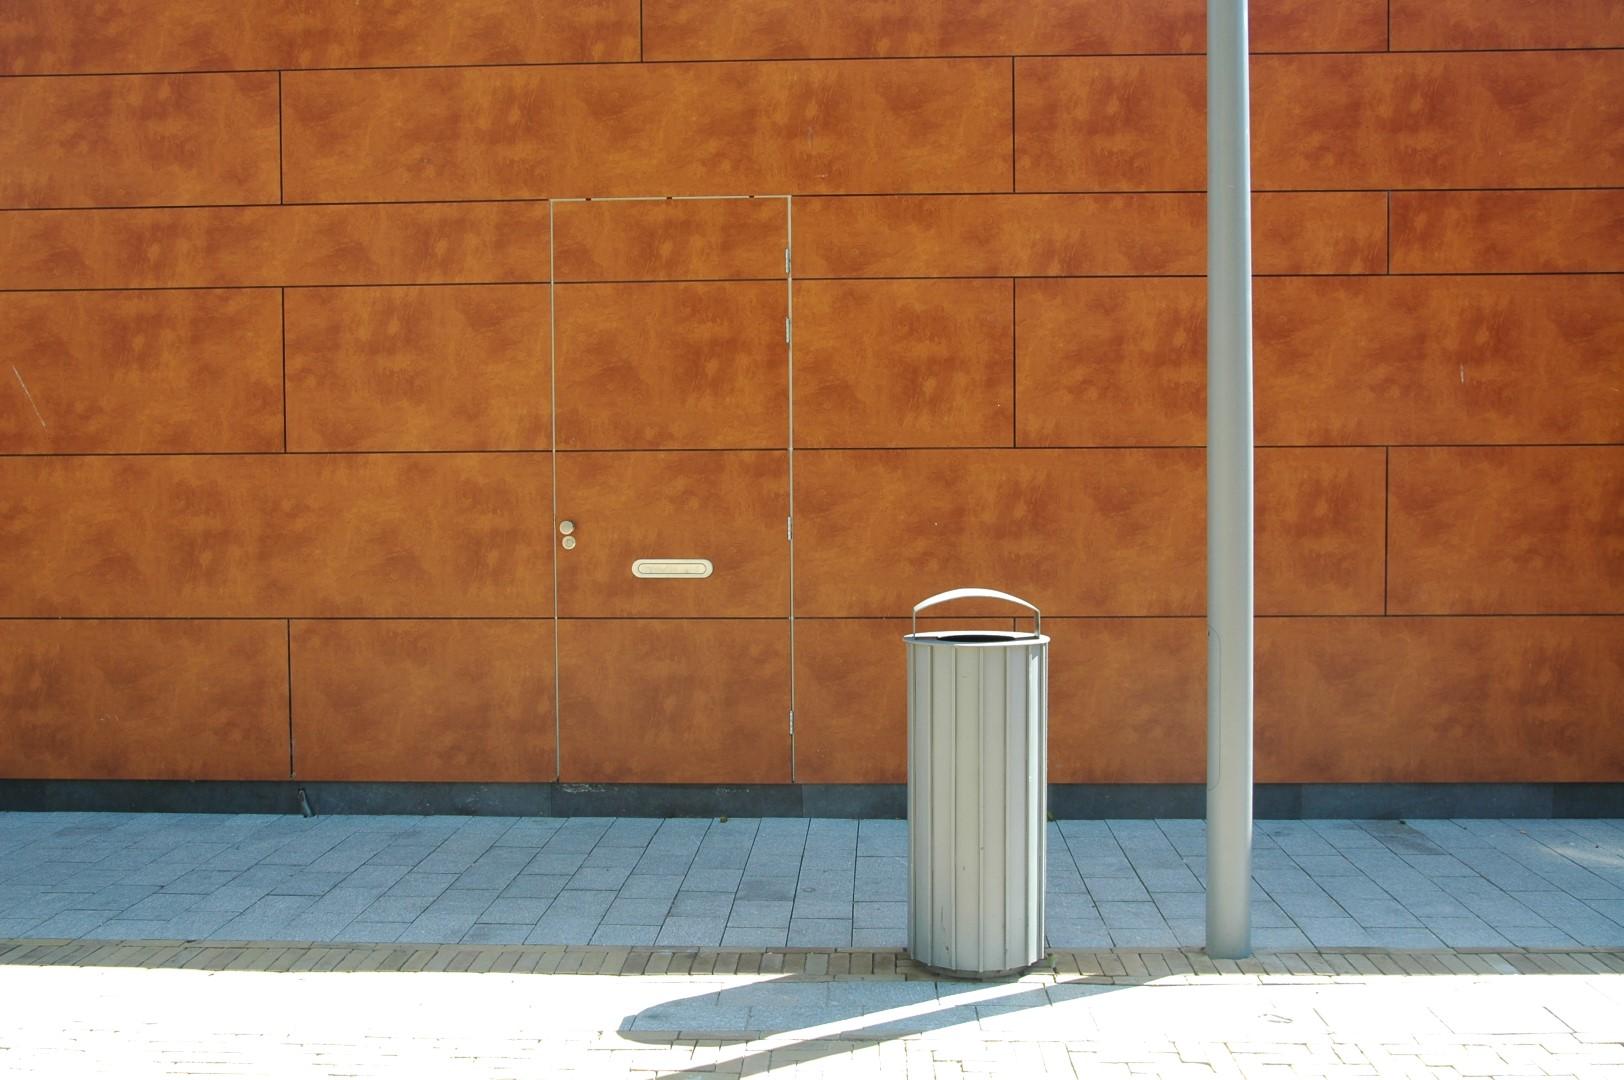 stoel_architect_Kampen_nieuwbouw_winkelcentrum Emmeloord (8) (Large)